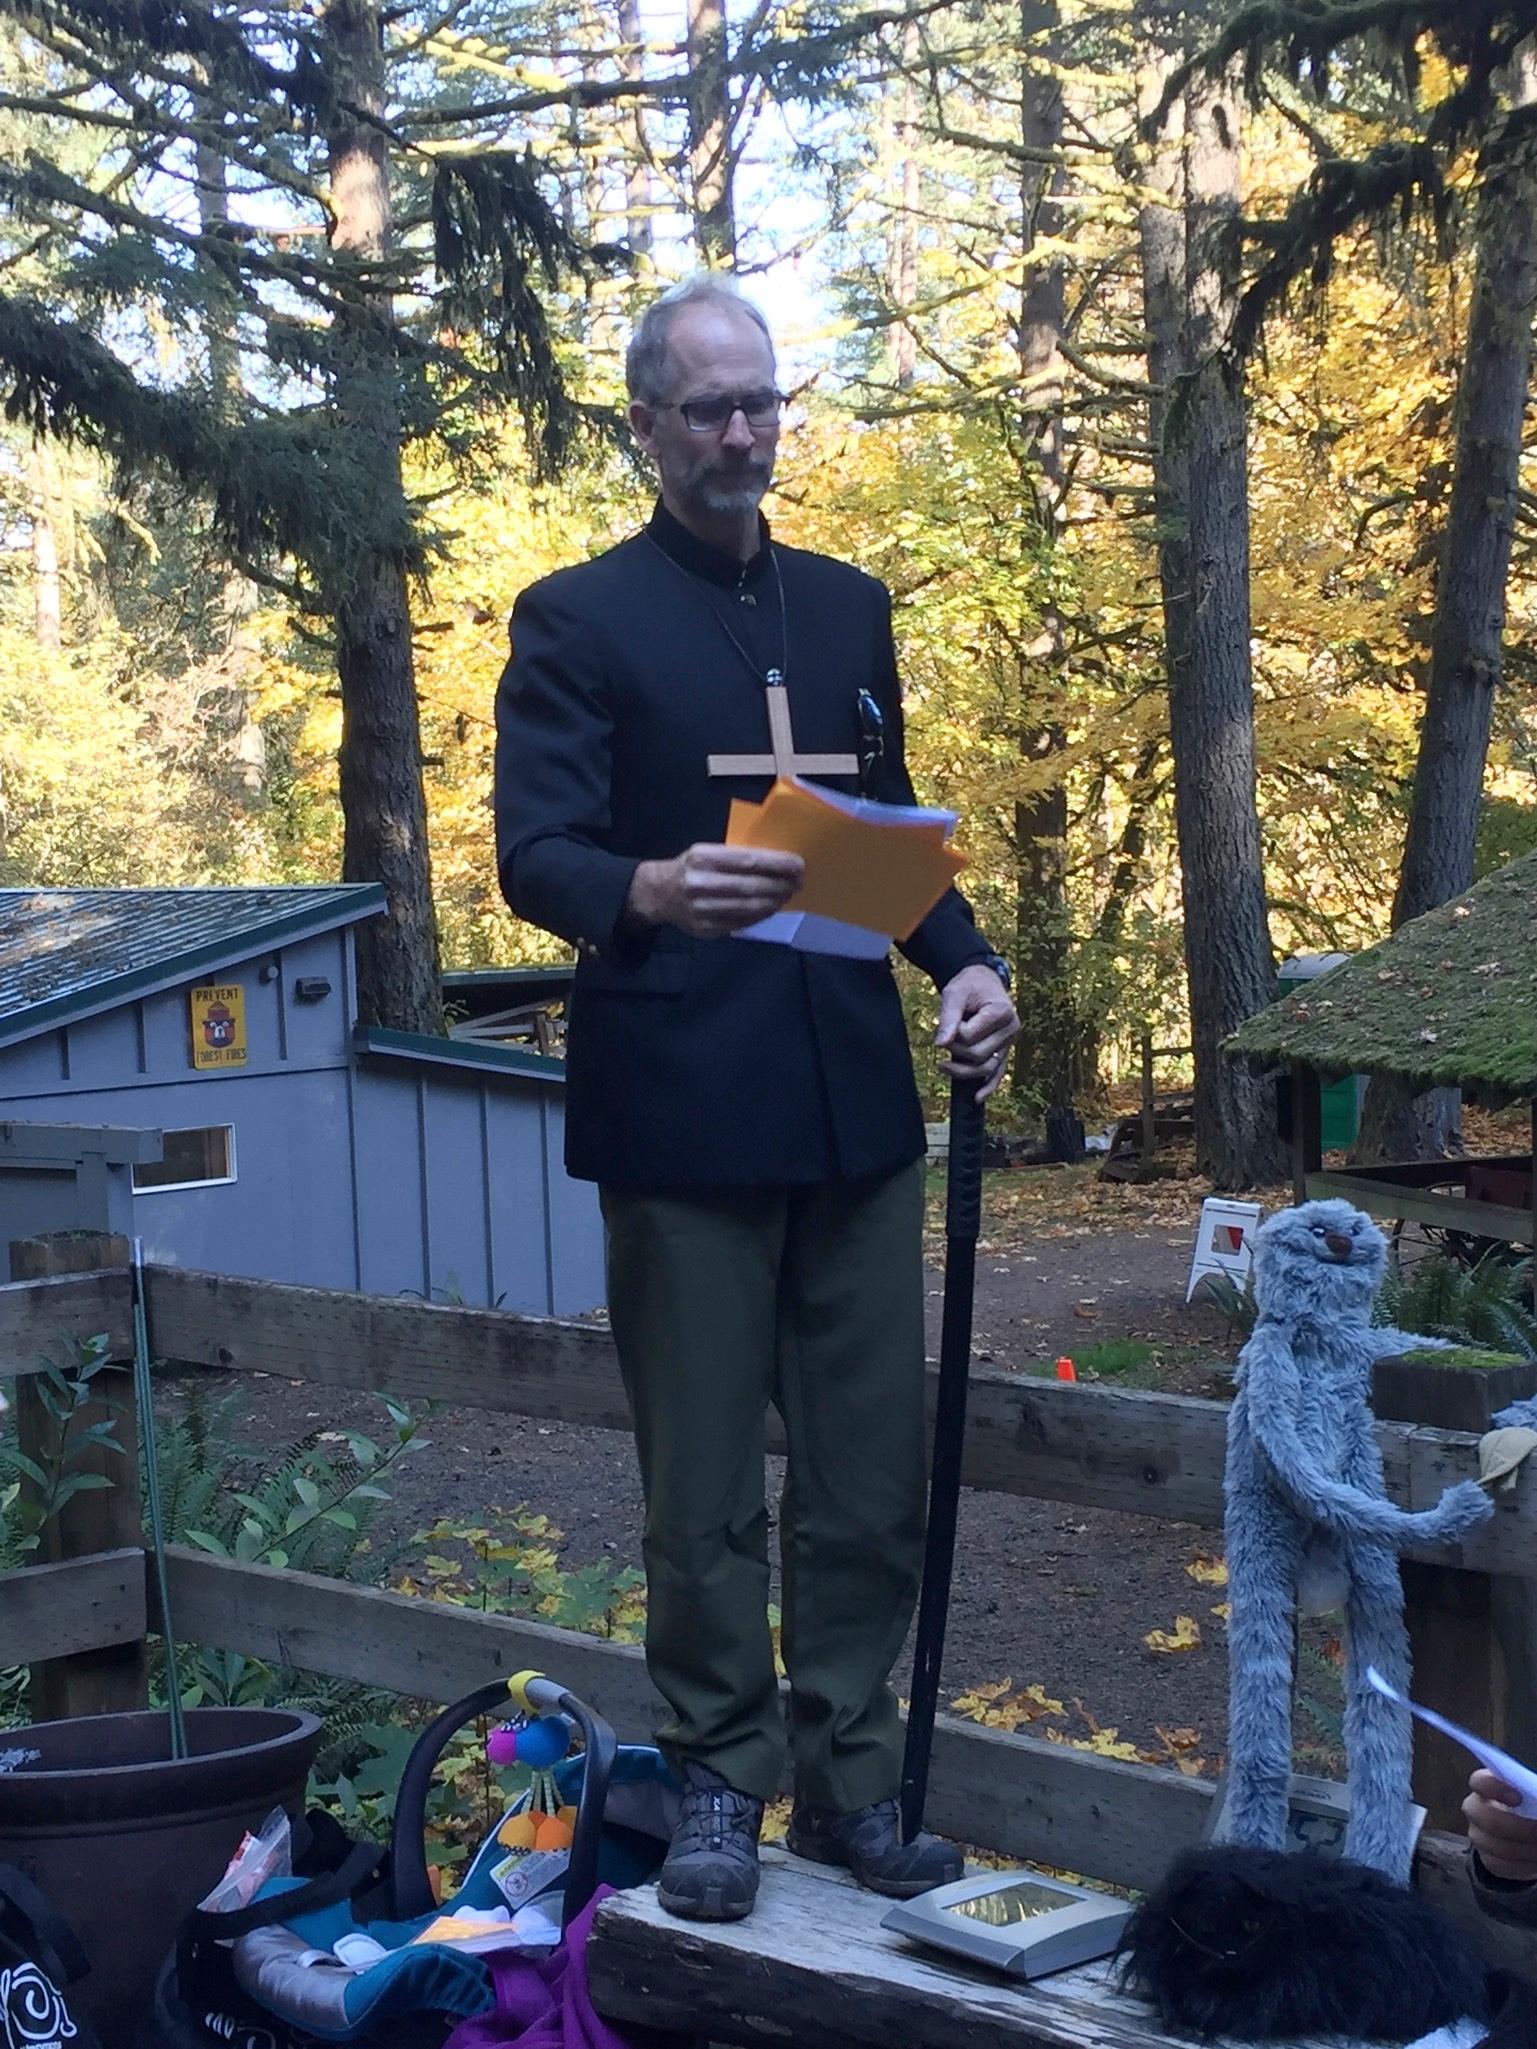 Meet director Herr Professor Vampire Researcher Mike Bruns